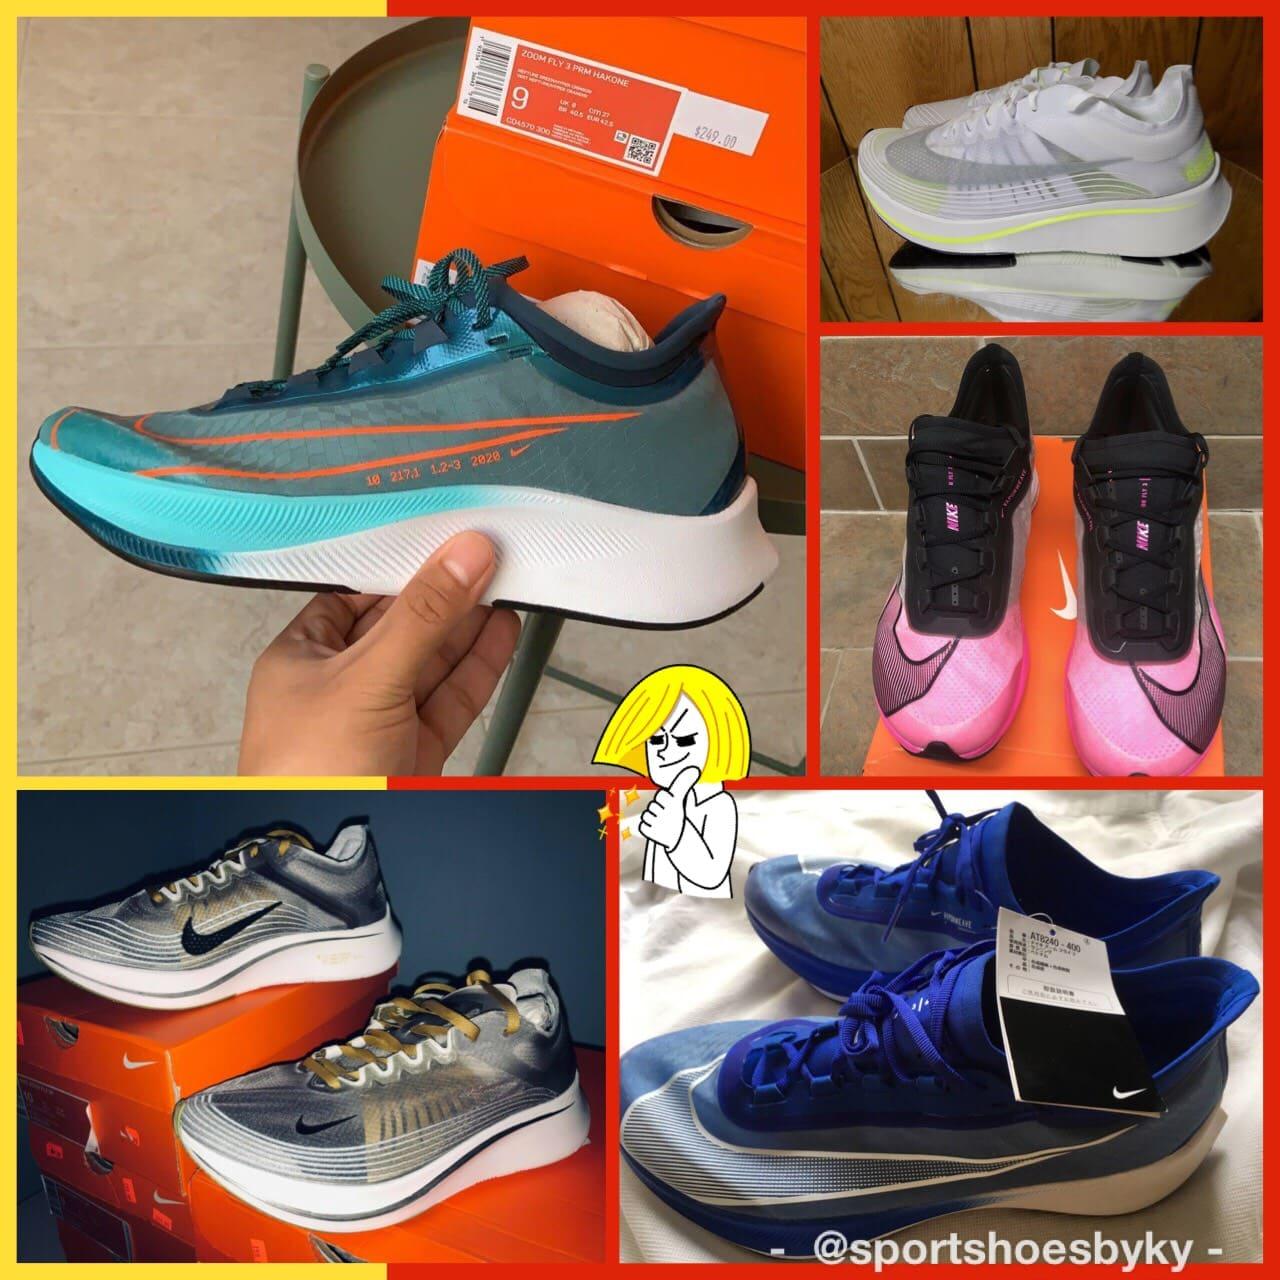 Nike Zoom Fly รุ่น ผู้ชาย